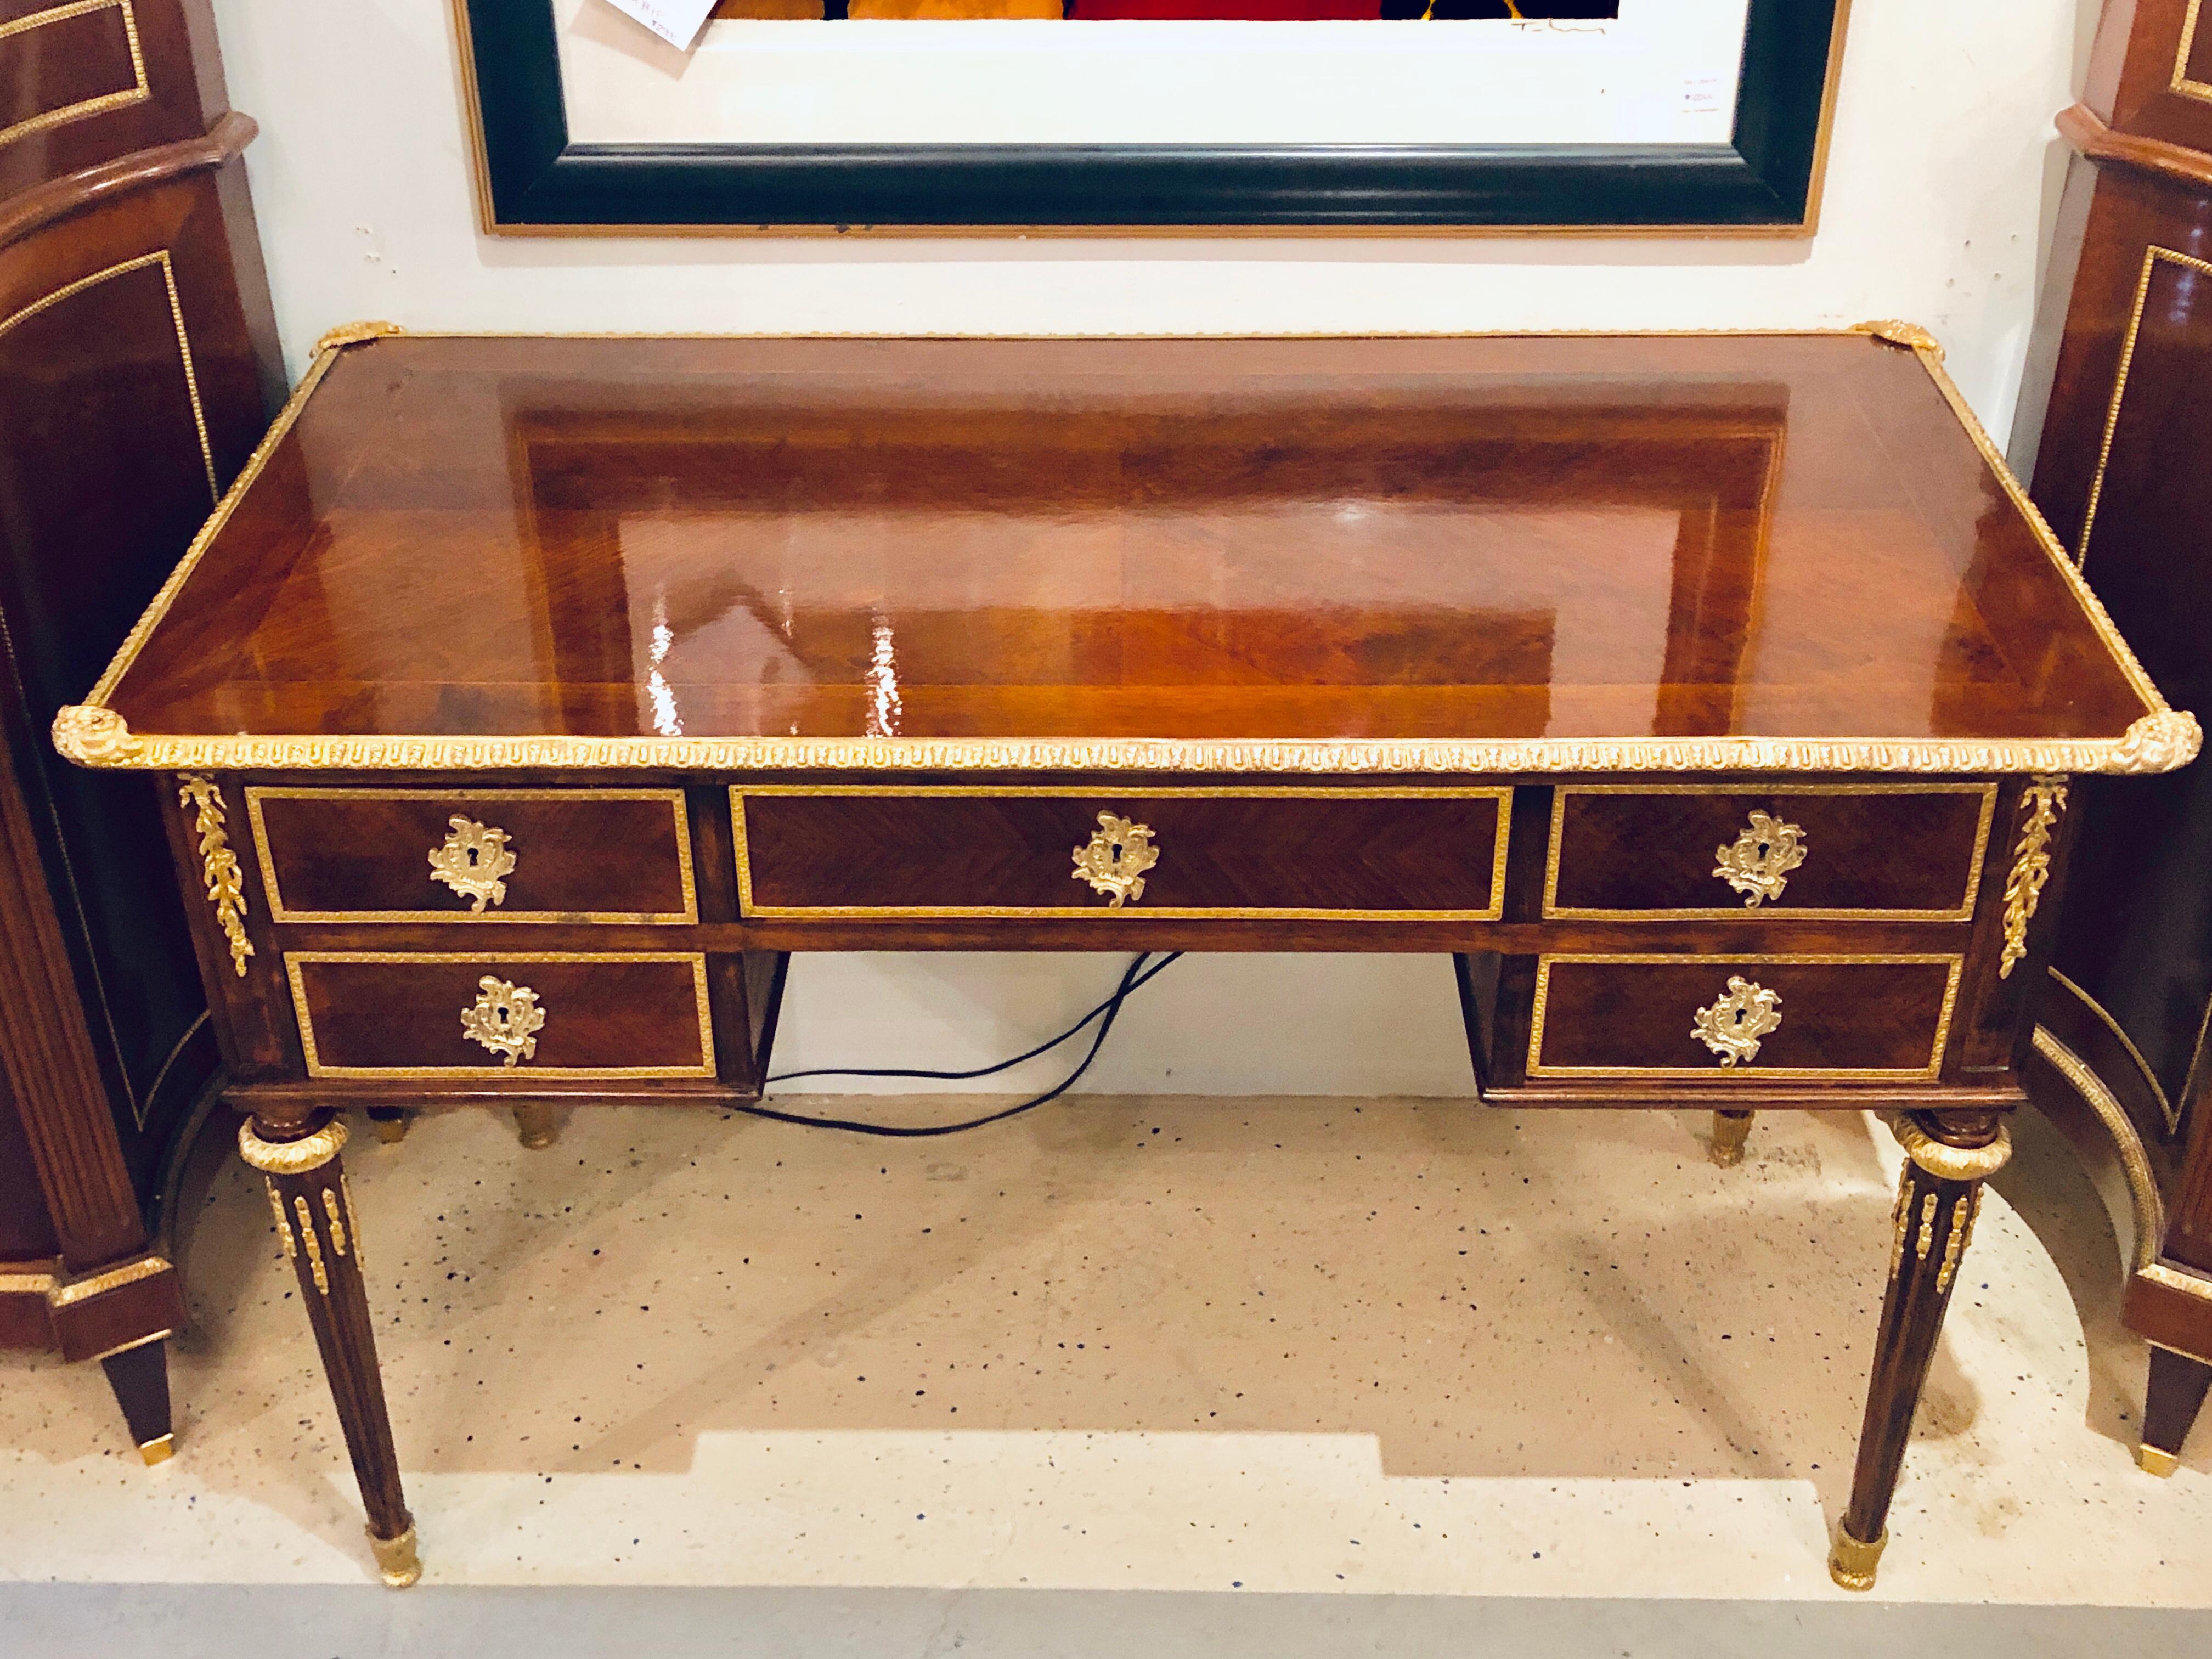 Louis xvi maison jansen style bronze mounted writing desk or